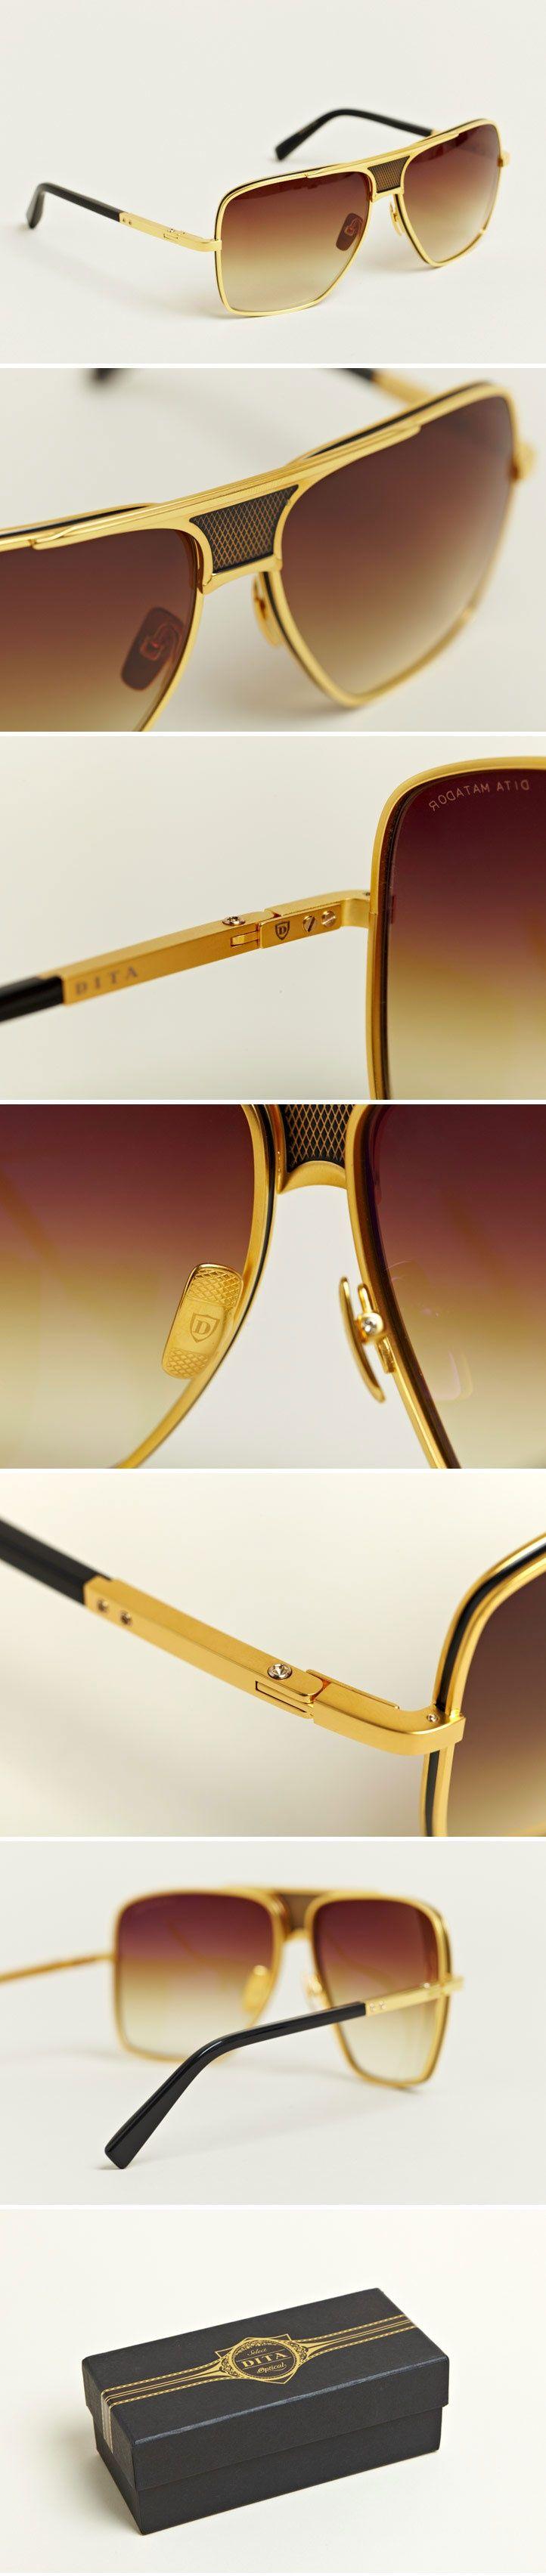 The 18K Dita Matador #DITAeyewear - www.vingerhoets-optics.be